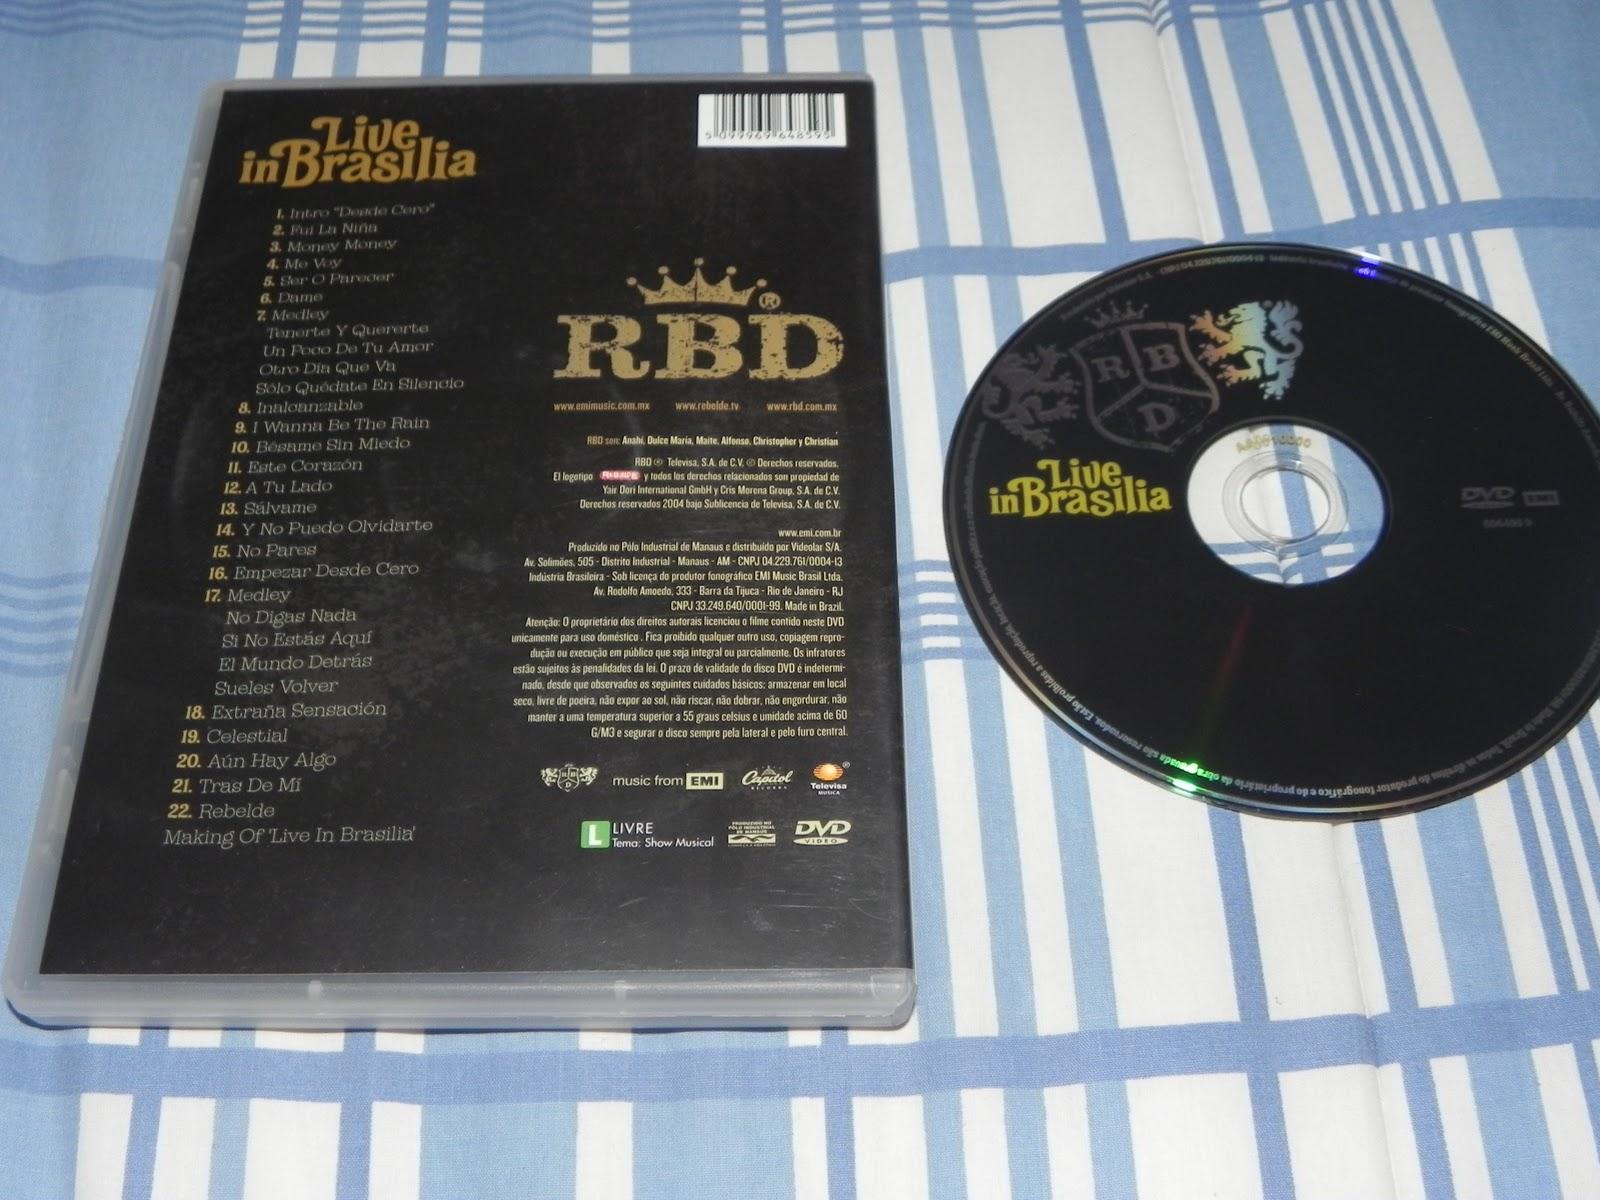 http://1.bp.blogspot.com/_eywOGClIhPo/TRXVNV_SWAI/AAAAAAAABjg/HhfDaSh-ZaU/s1600/DSCN3338.JPG